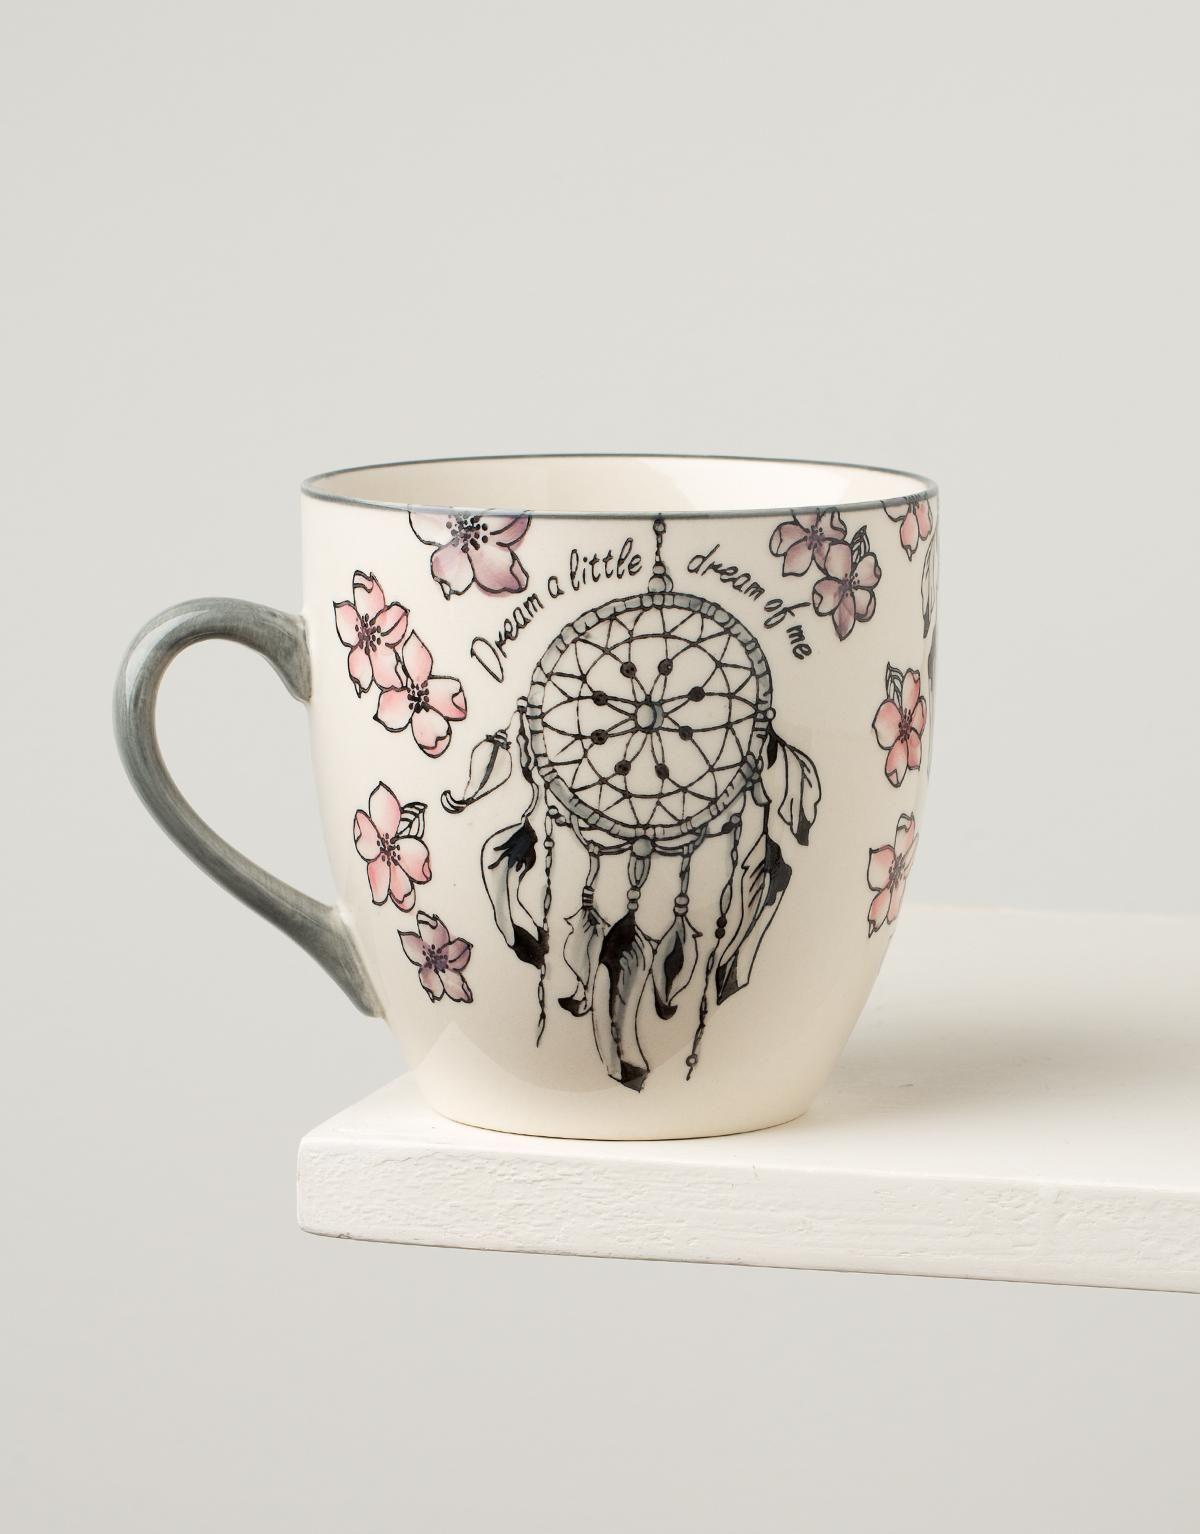 Dream Catcher Xl Mugg Painted Mugs Mugs Dream Catcher Painting